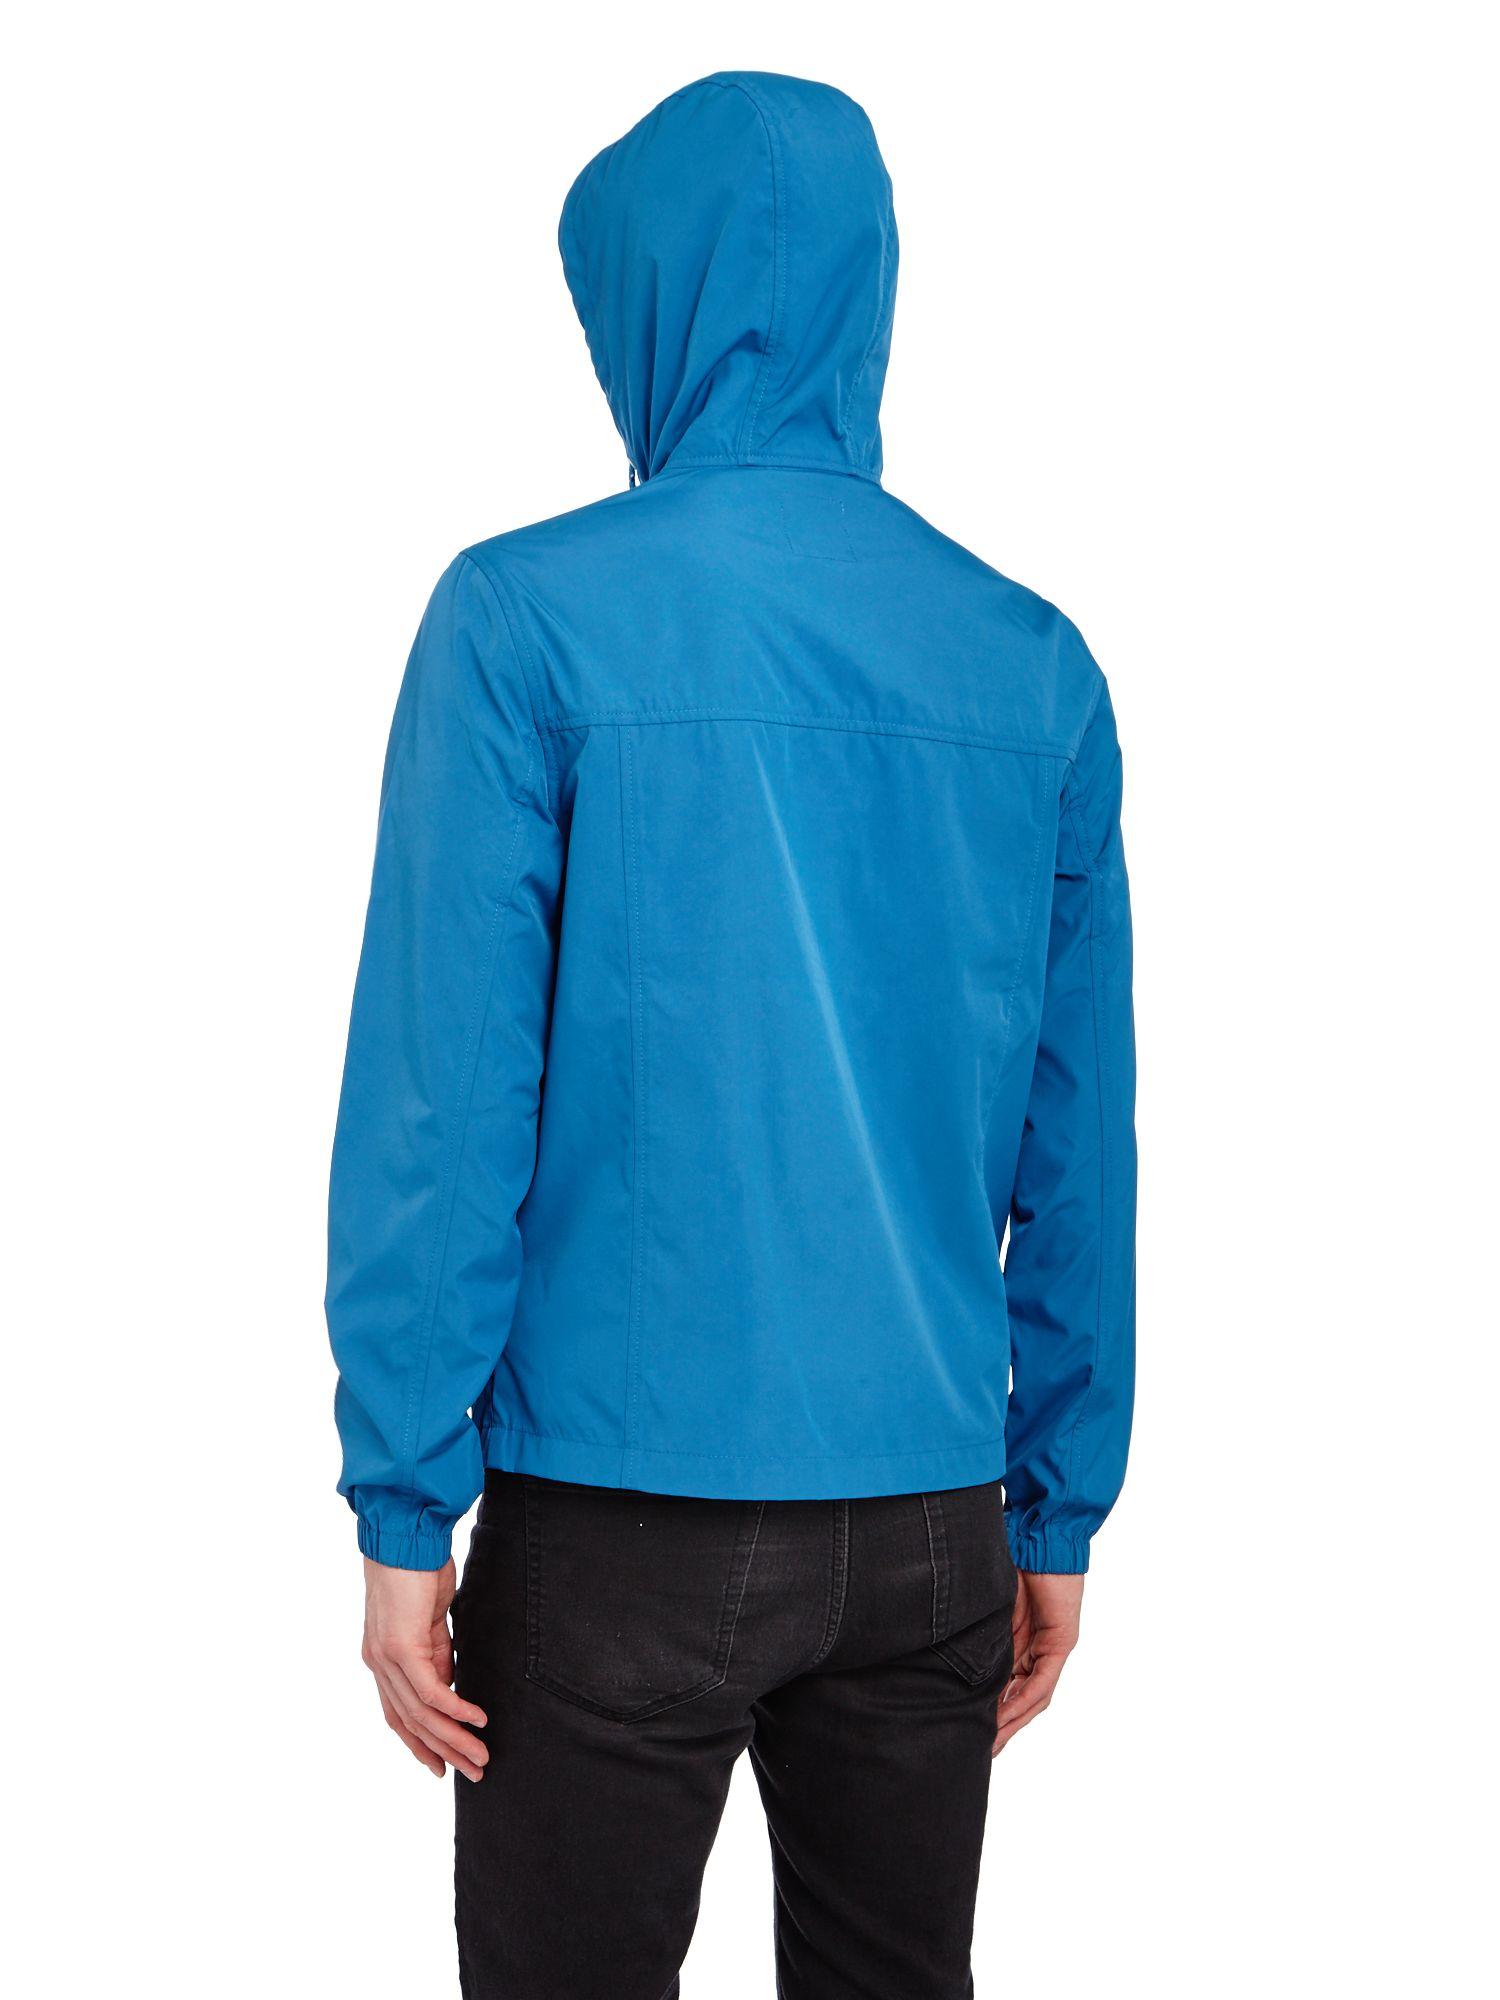 Original Penguin Synthetic Hydro Print Festival Jacket in Blue for Men